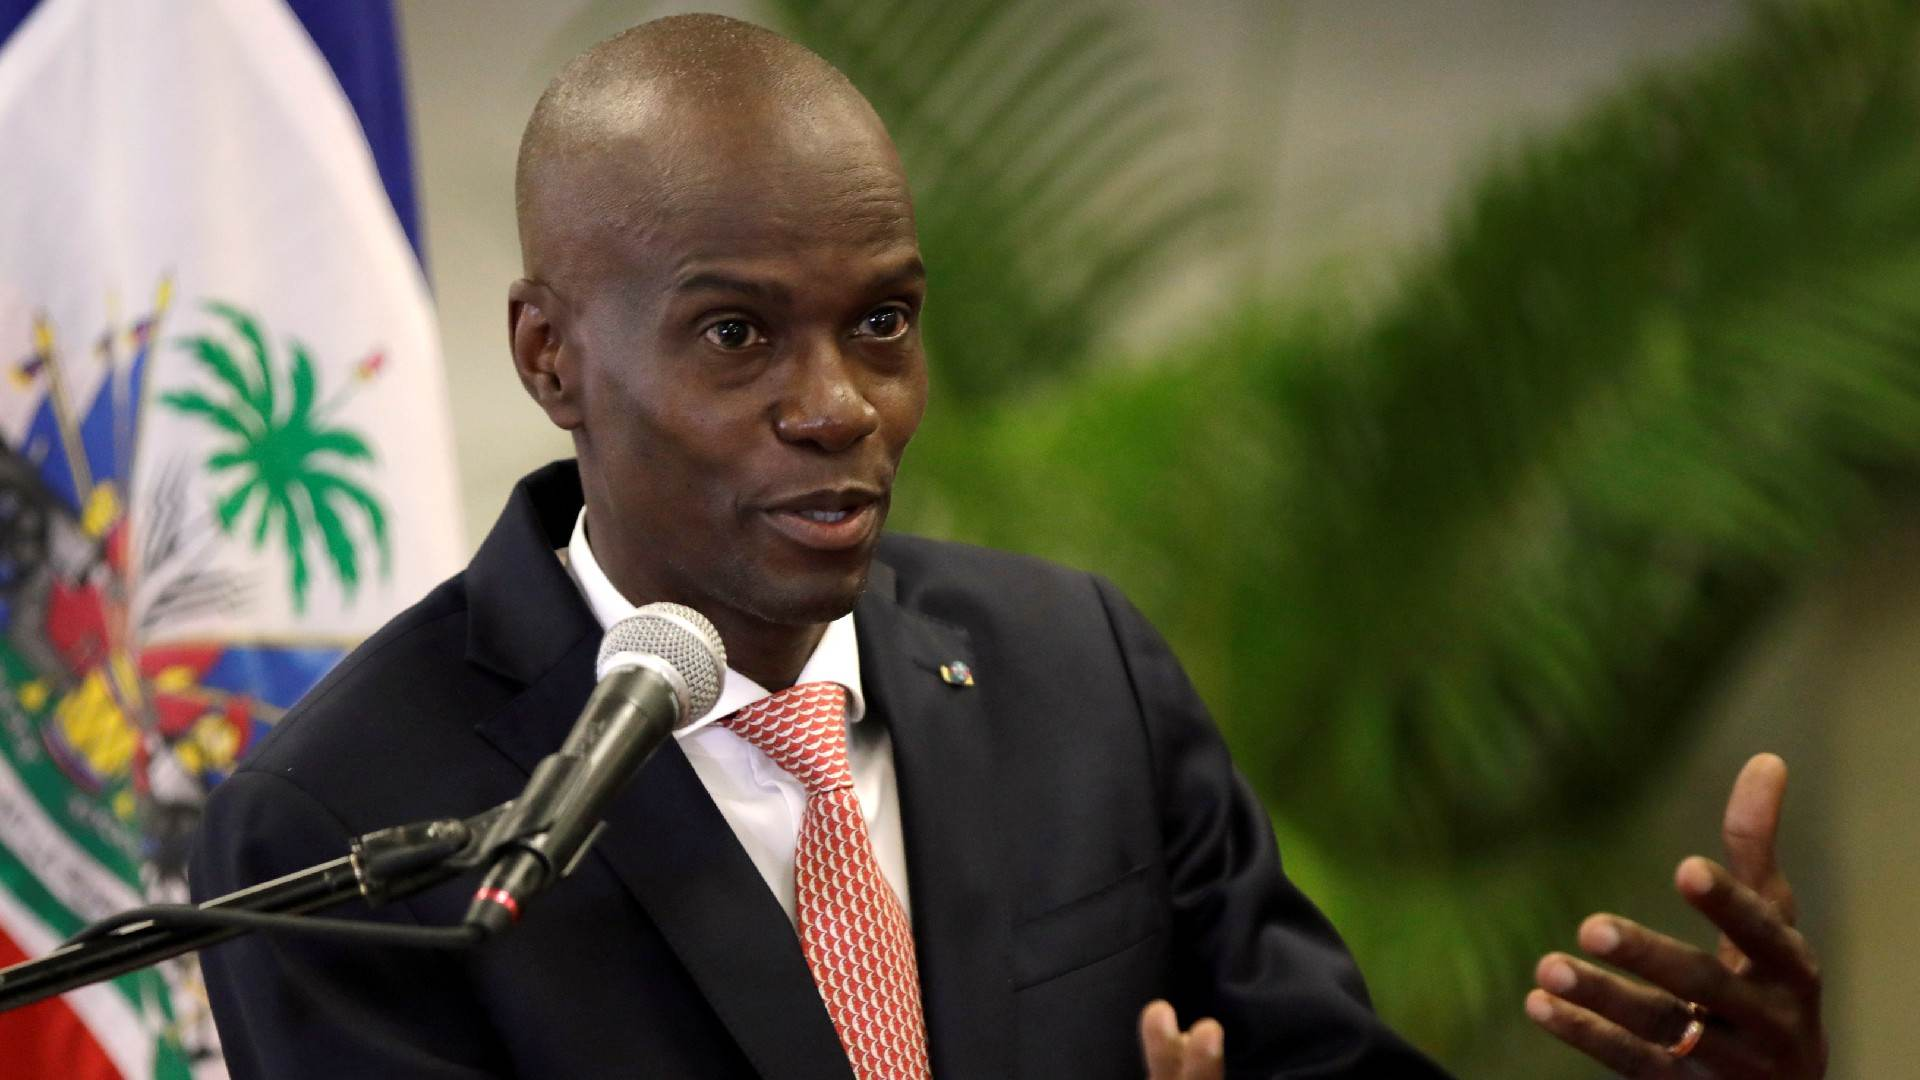 Jovenel Moise durante entrevista coletiva em Porto Príncipe